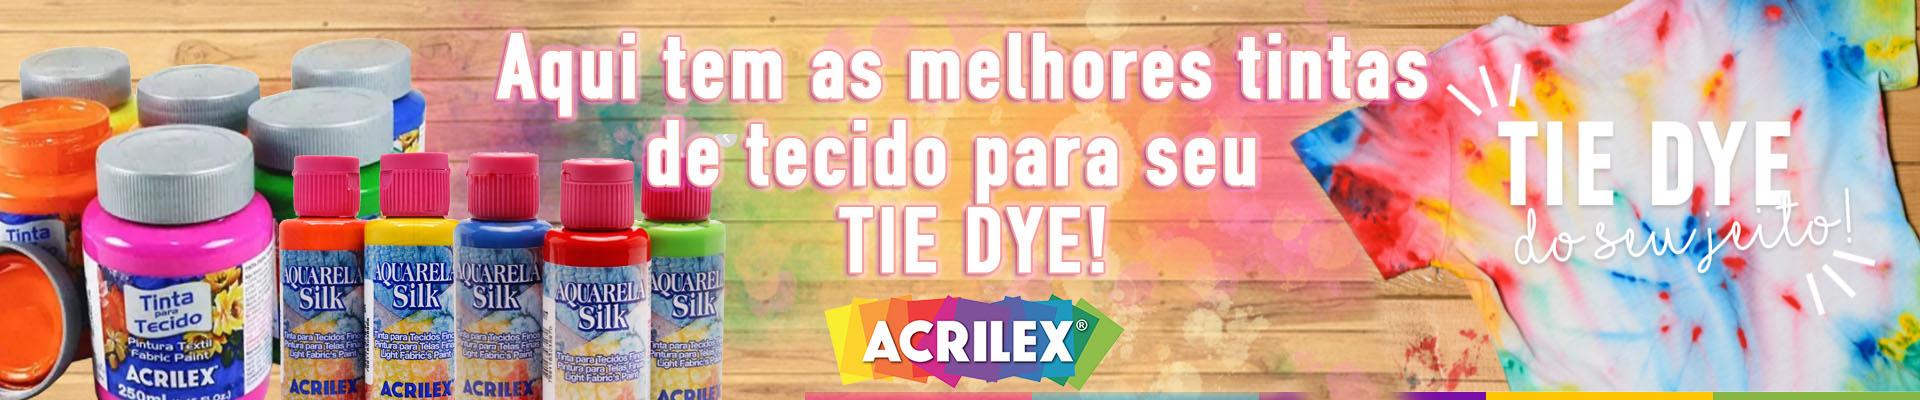 TIE DAY ACRILEX